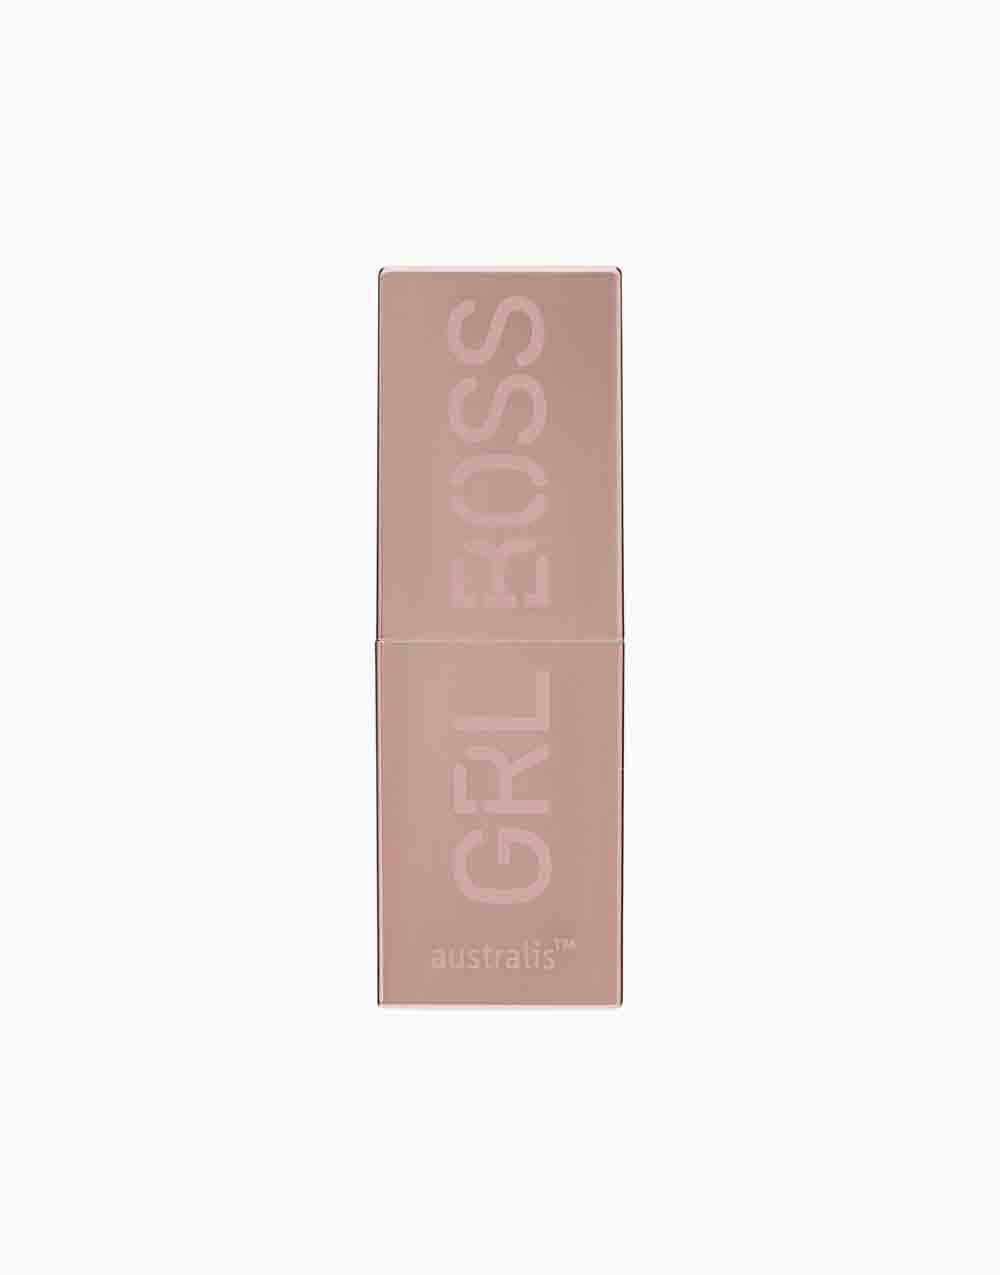 Mini GRLBOSS Satin Lipstick by Australis  